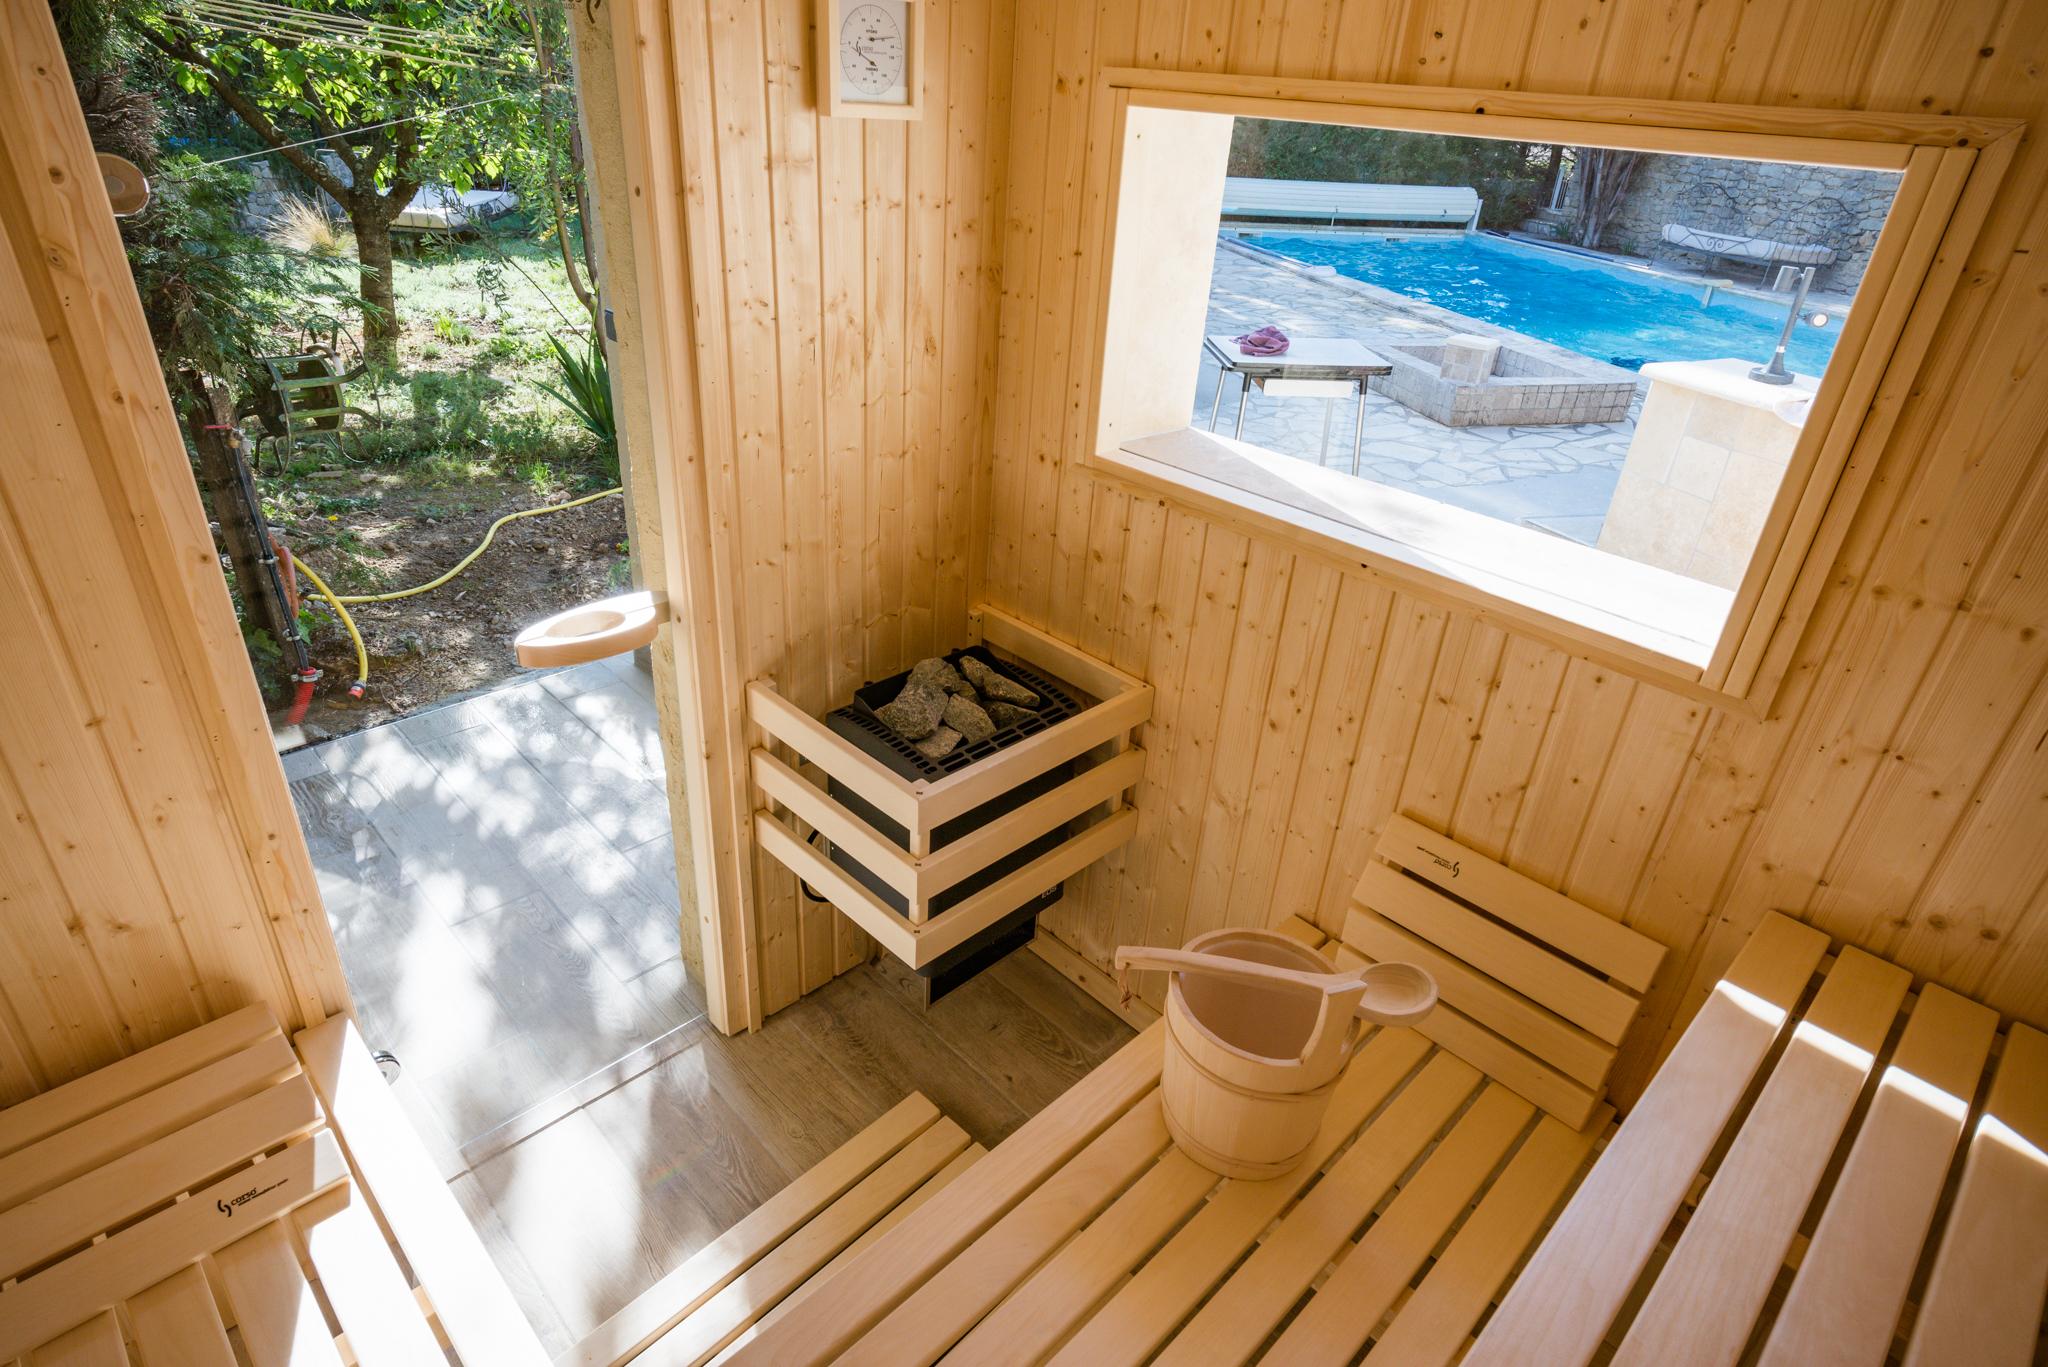 feriebolig-frankrig-sauna-pool-DSC_4645.jpg